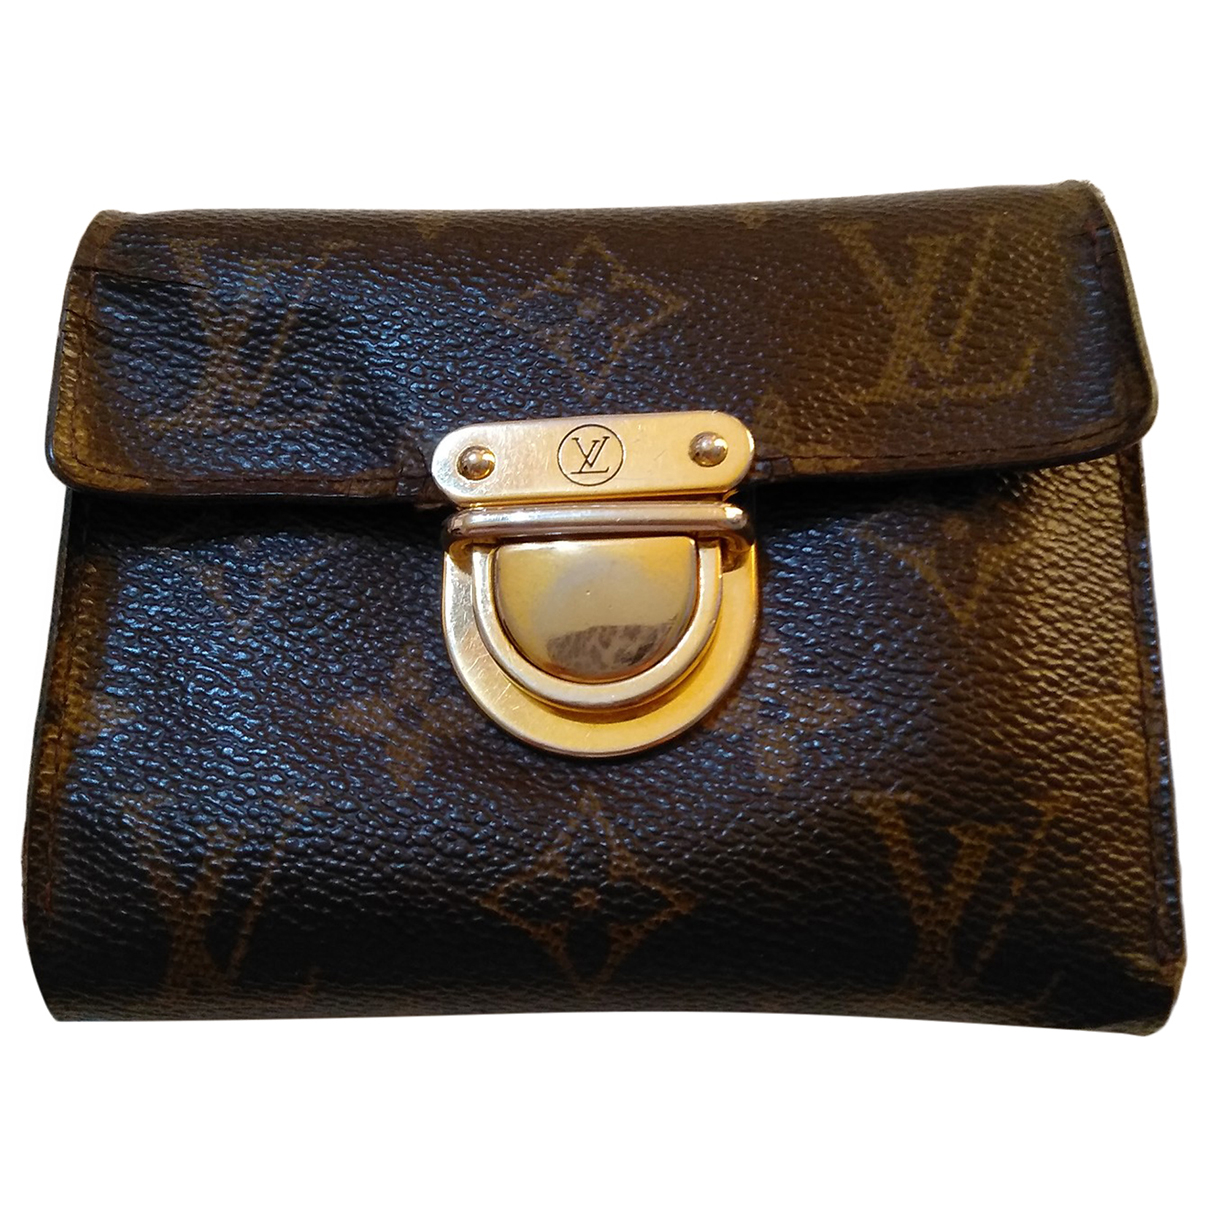 Louis Vuitton - Portefeuille Koala pour femme en toile - marron